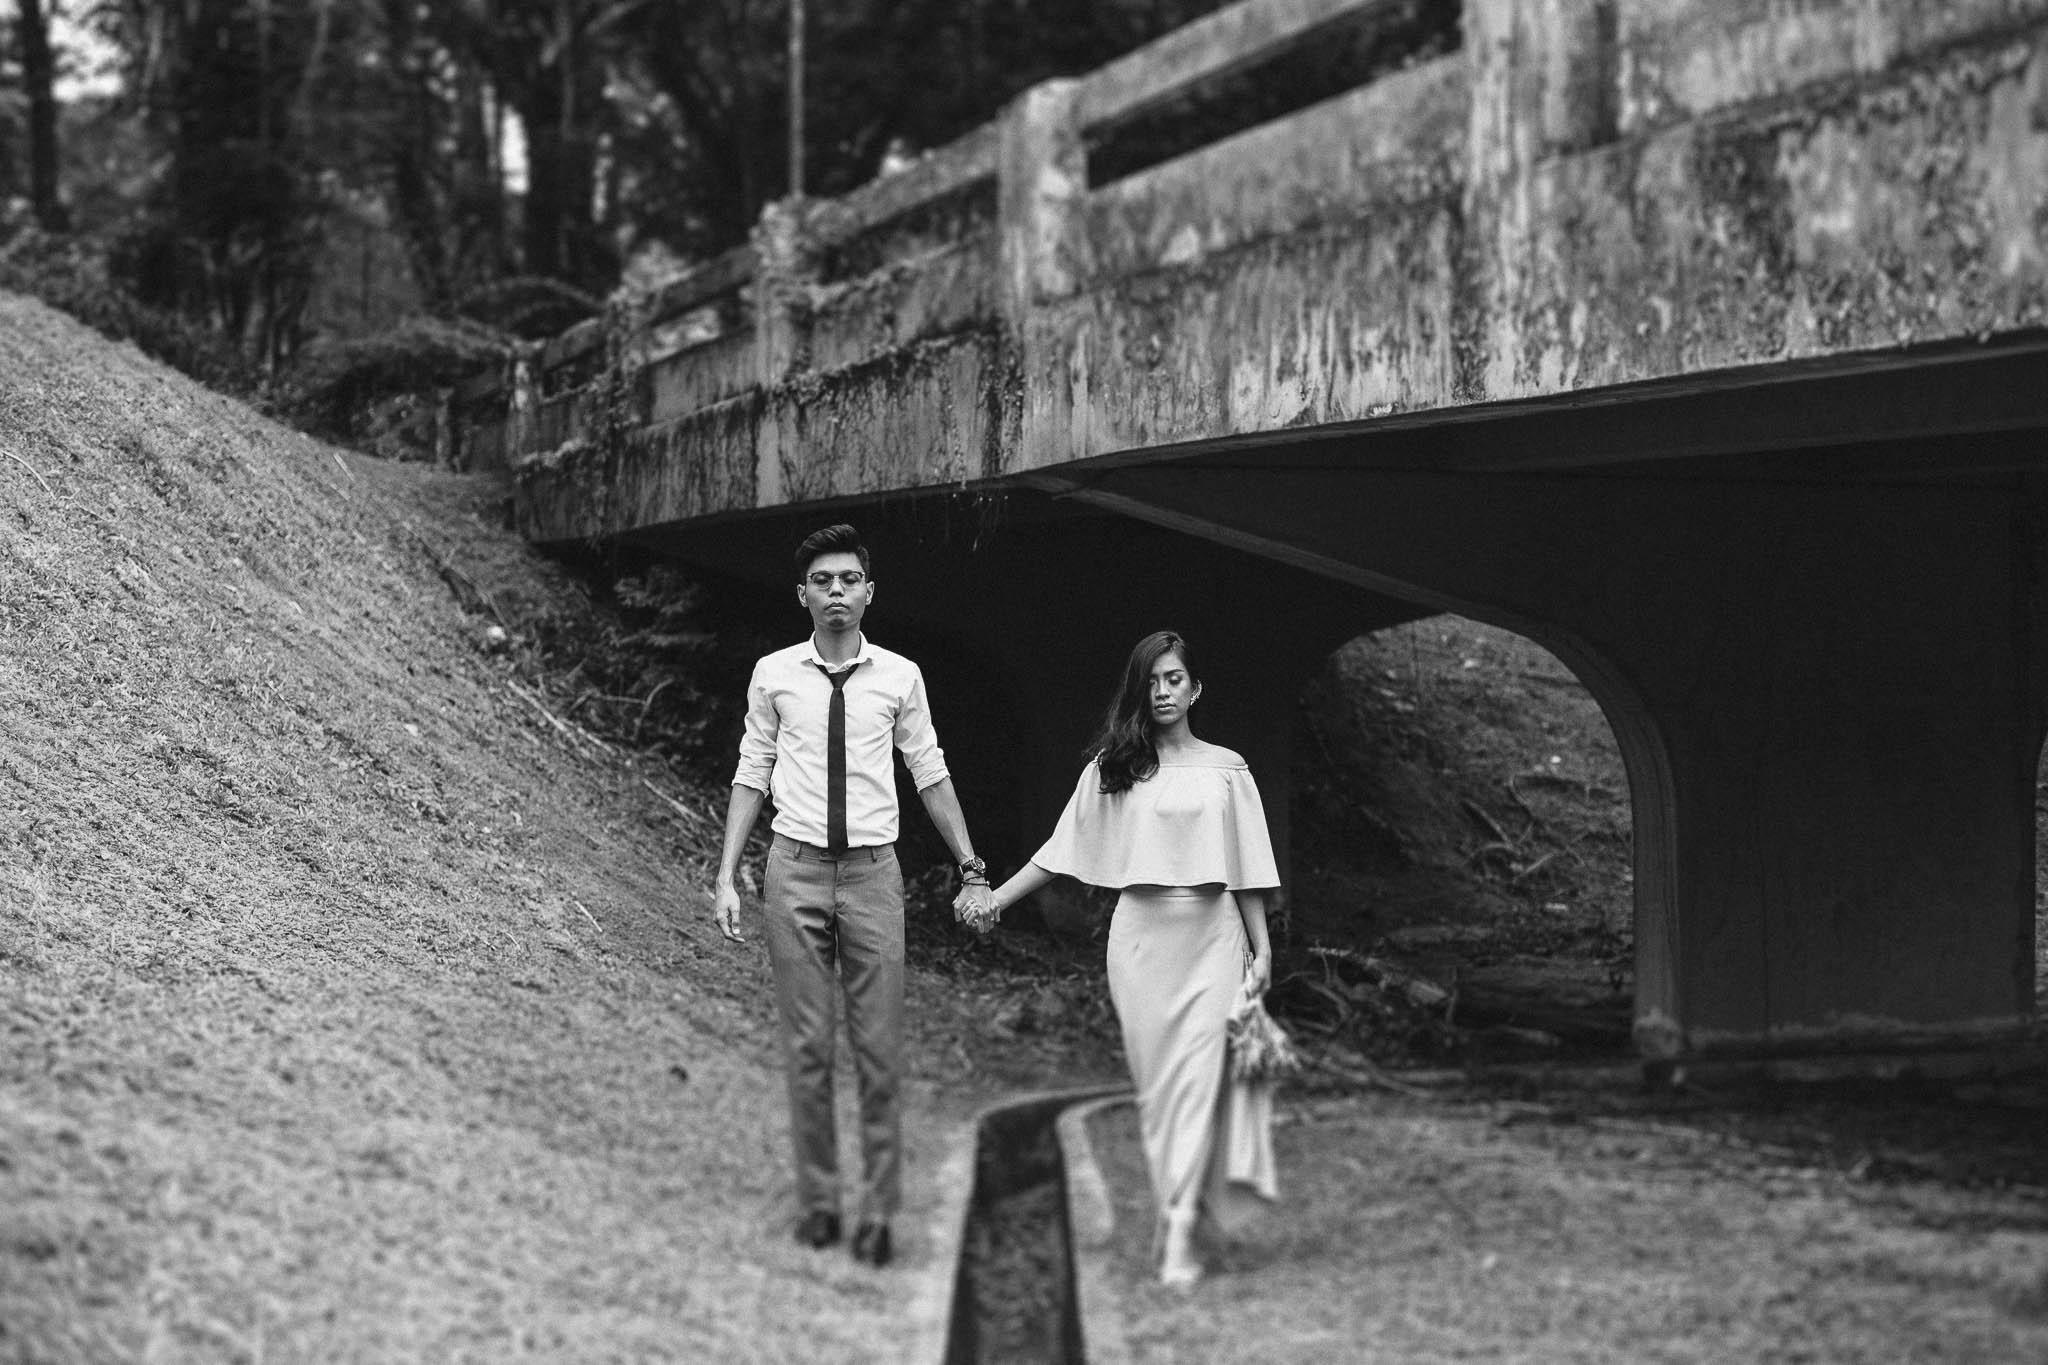 singapore-wedding-photographer-malay-indian-pre-wedding-travel-wmt-2015-02.jpg